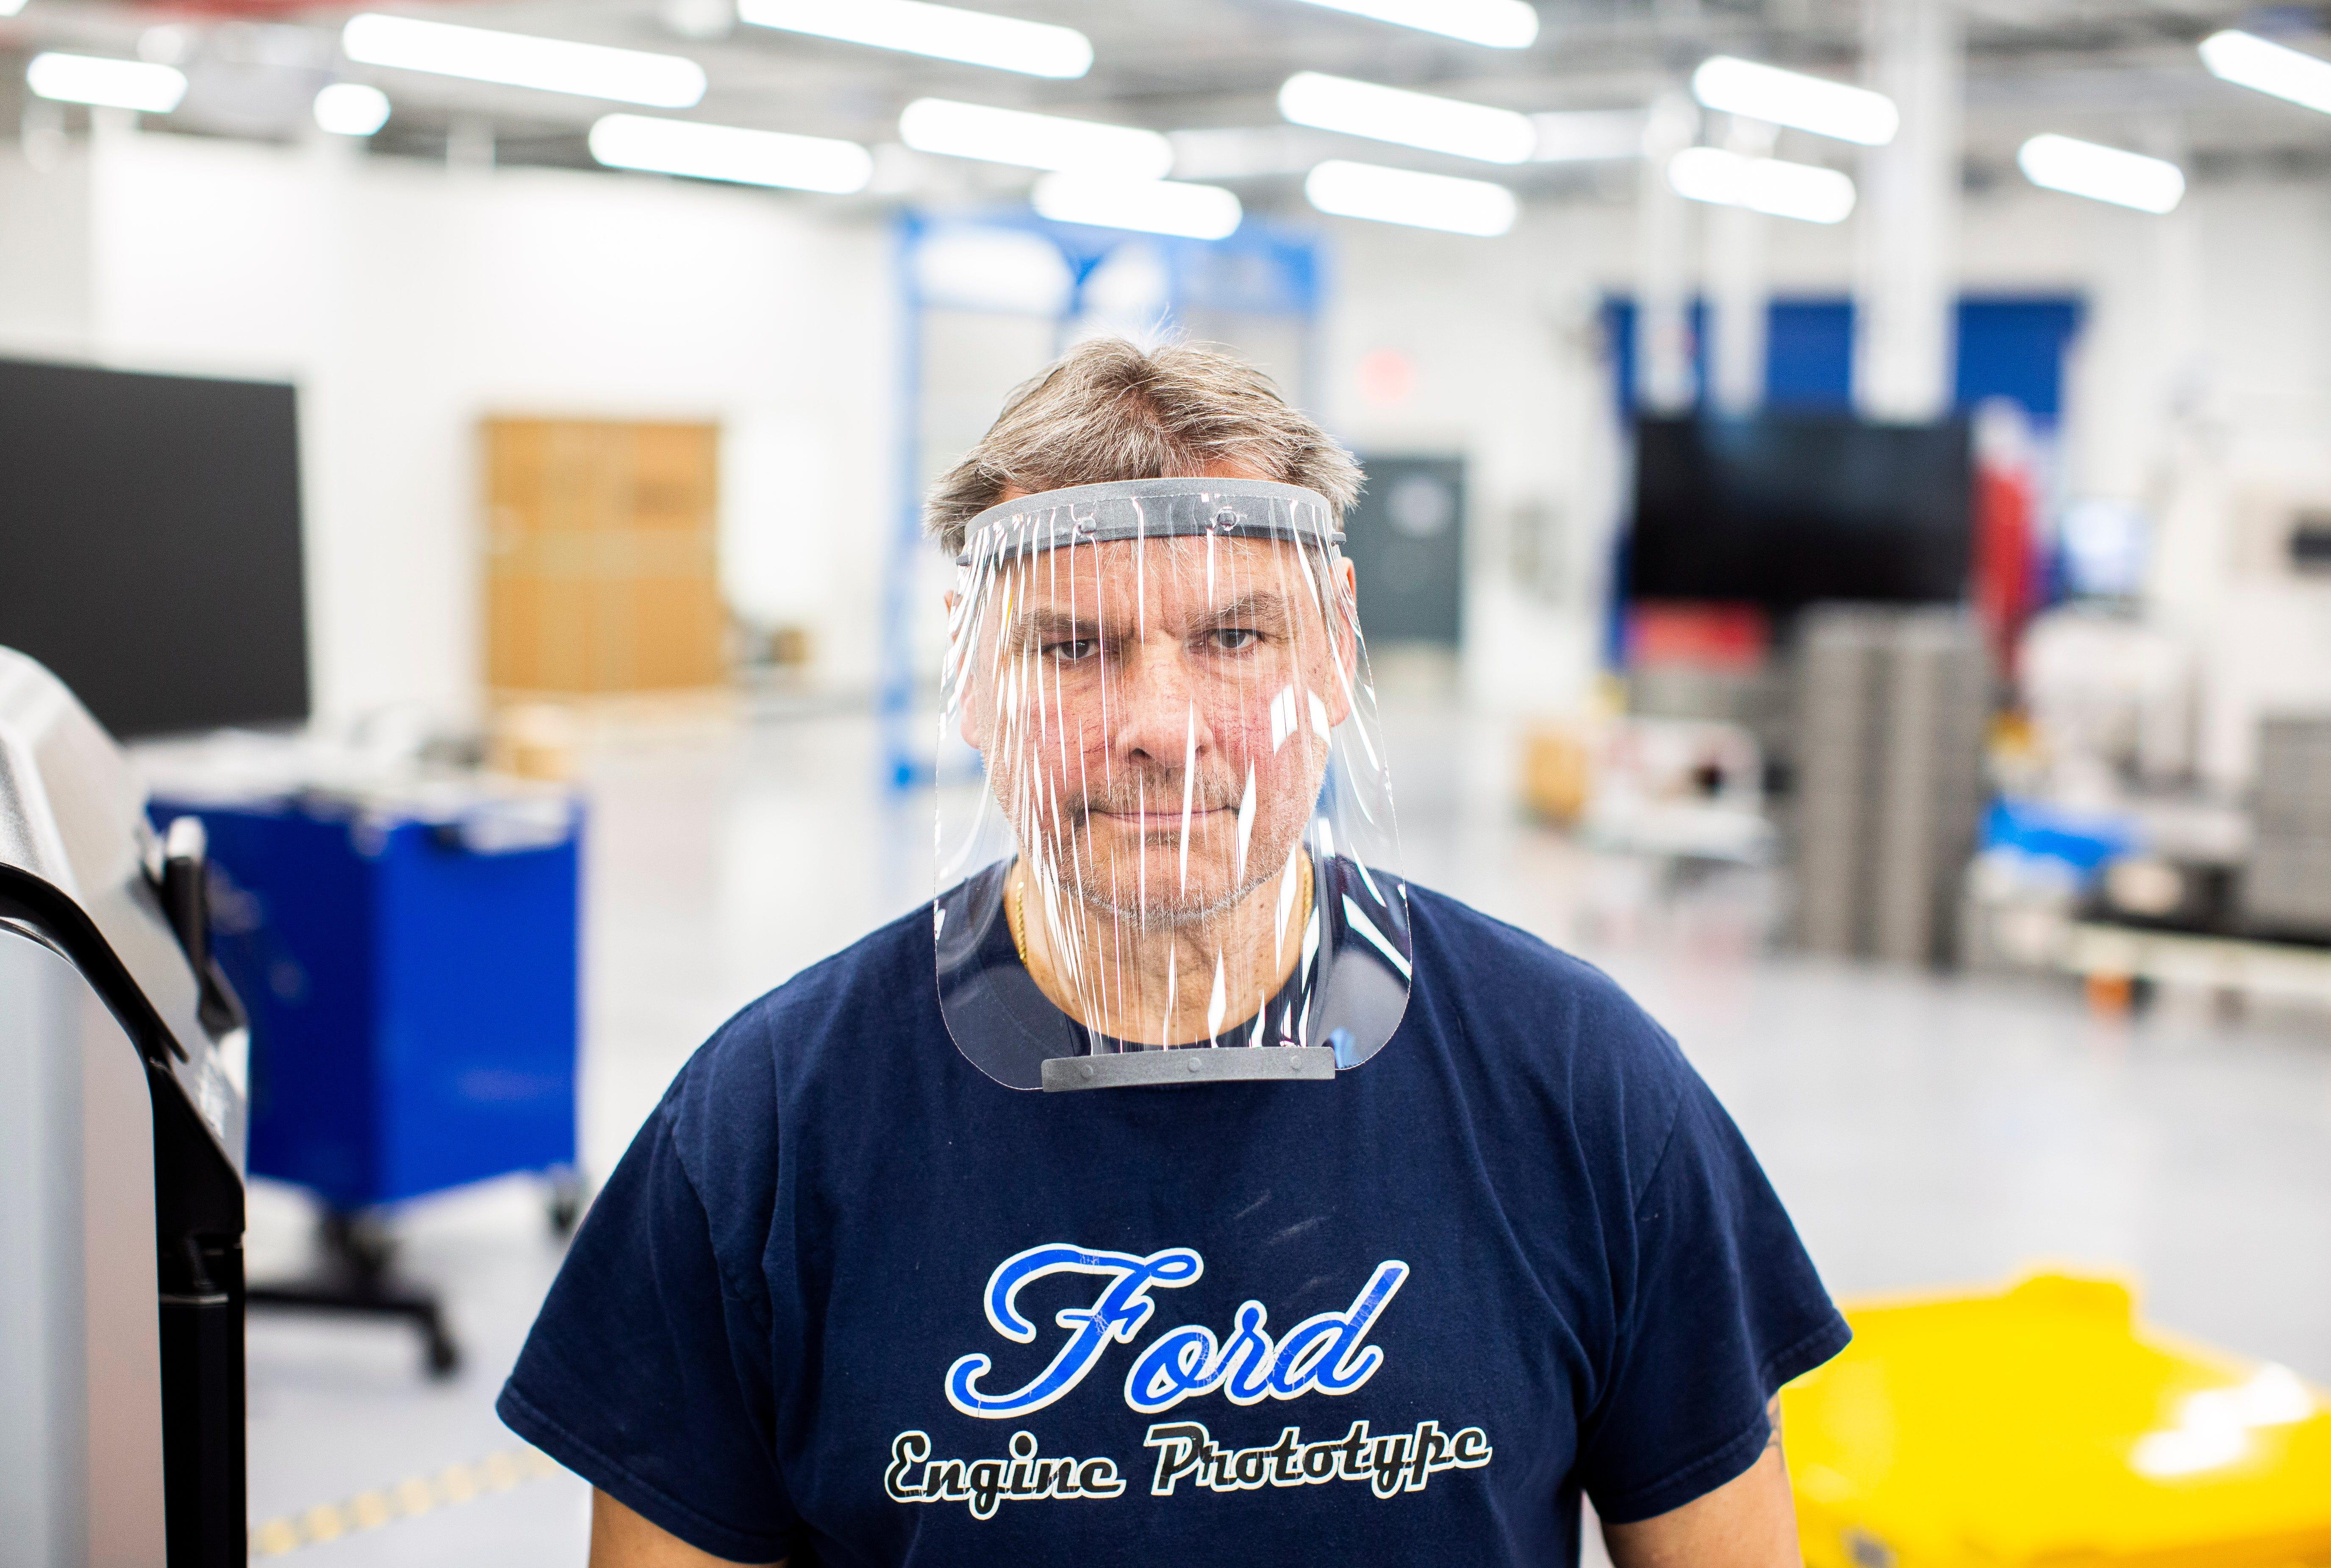 3m company face mask